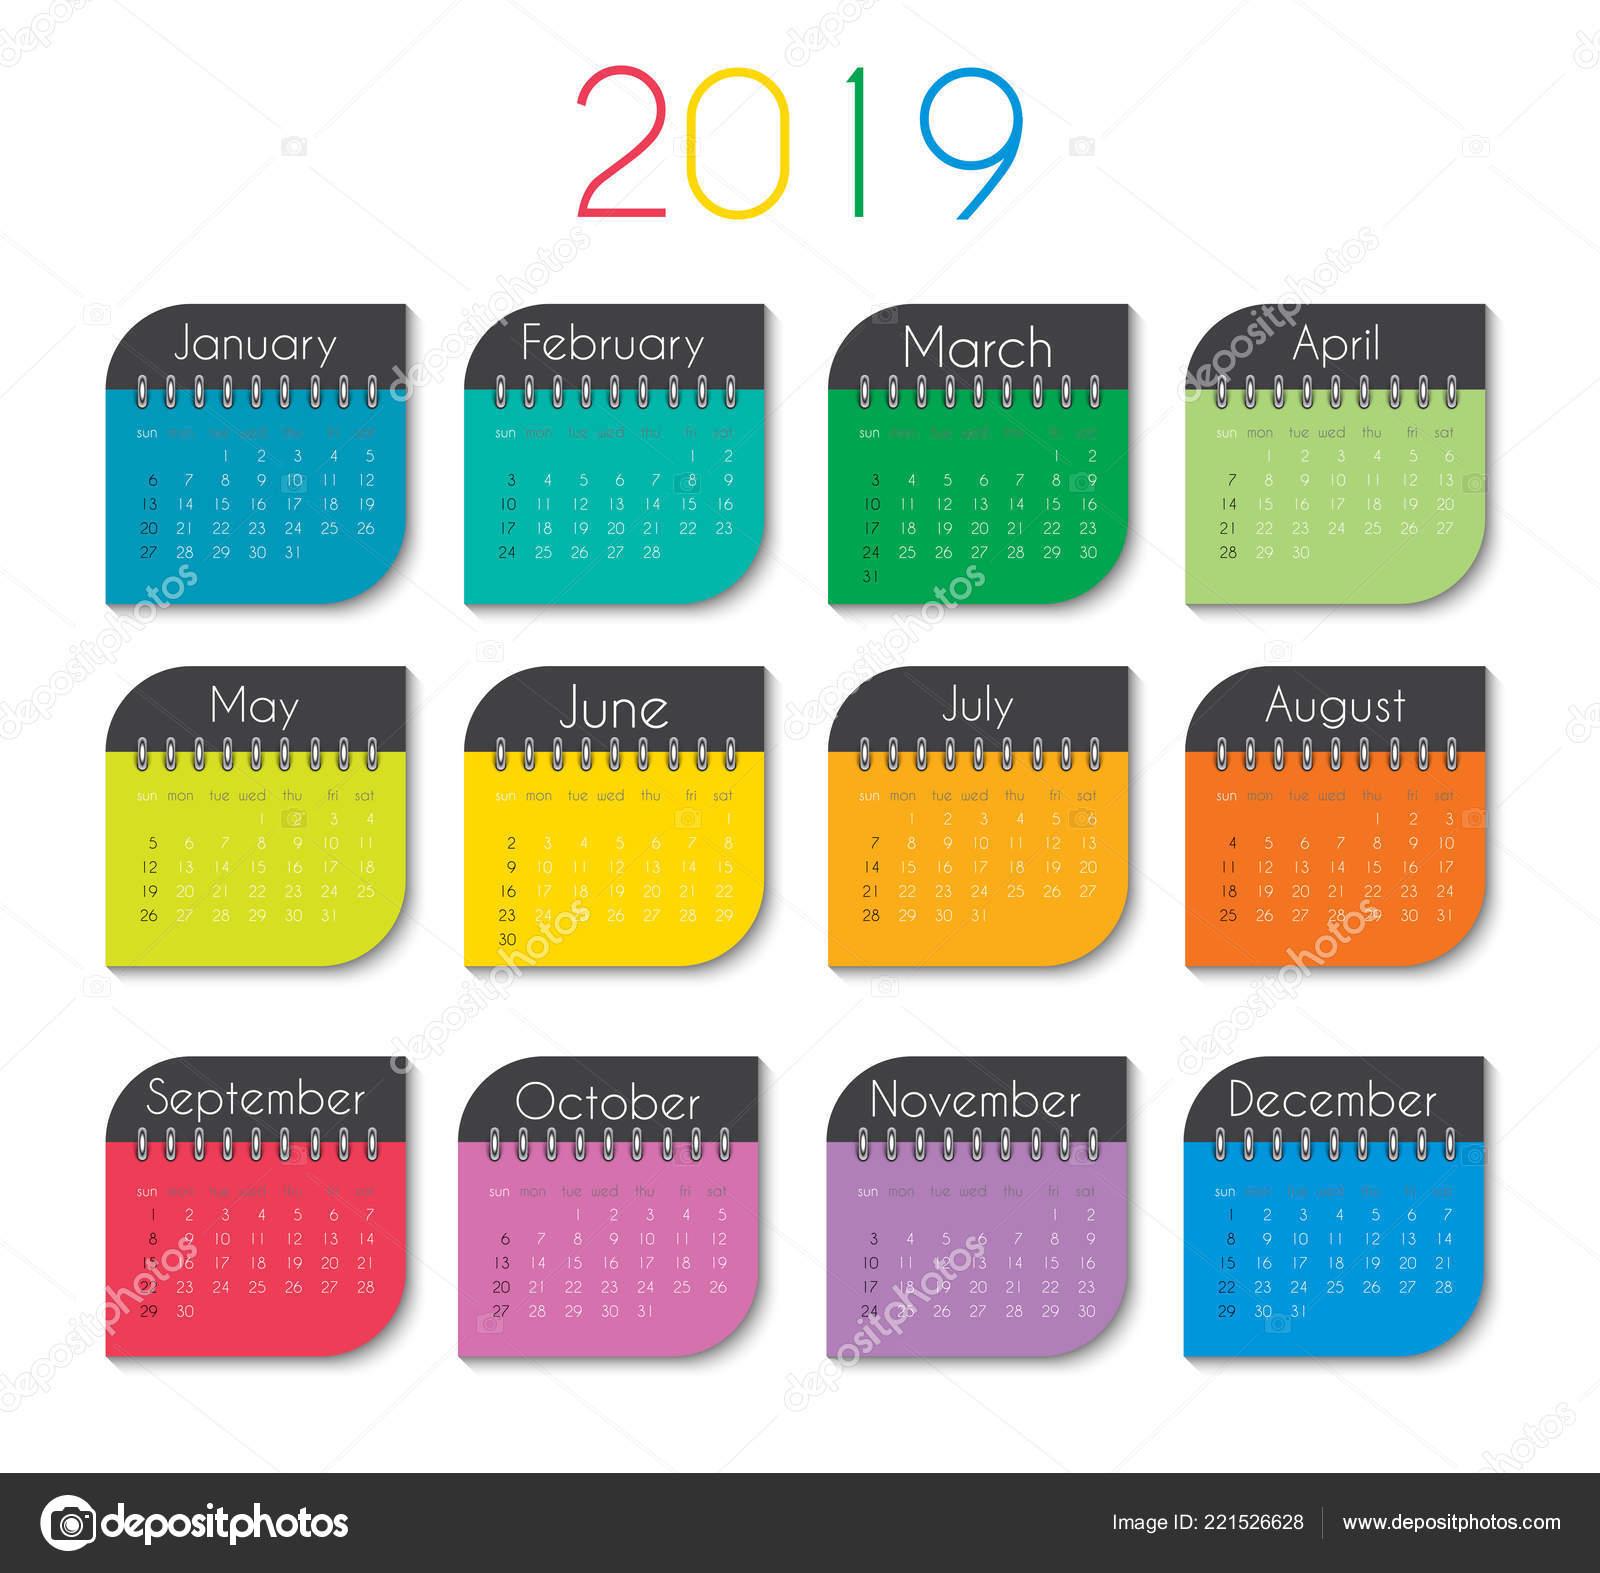 keyboard calendar template download